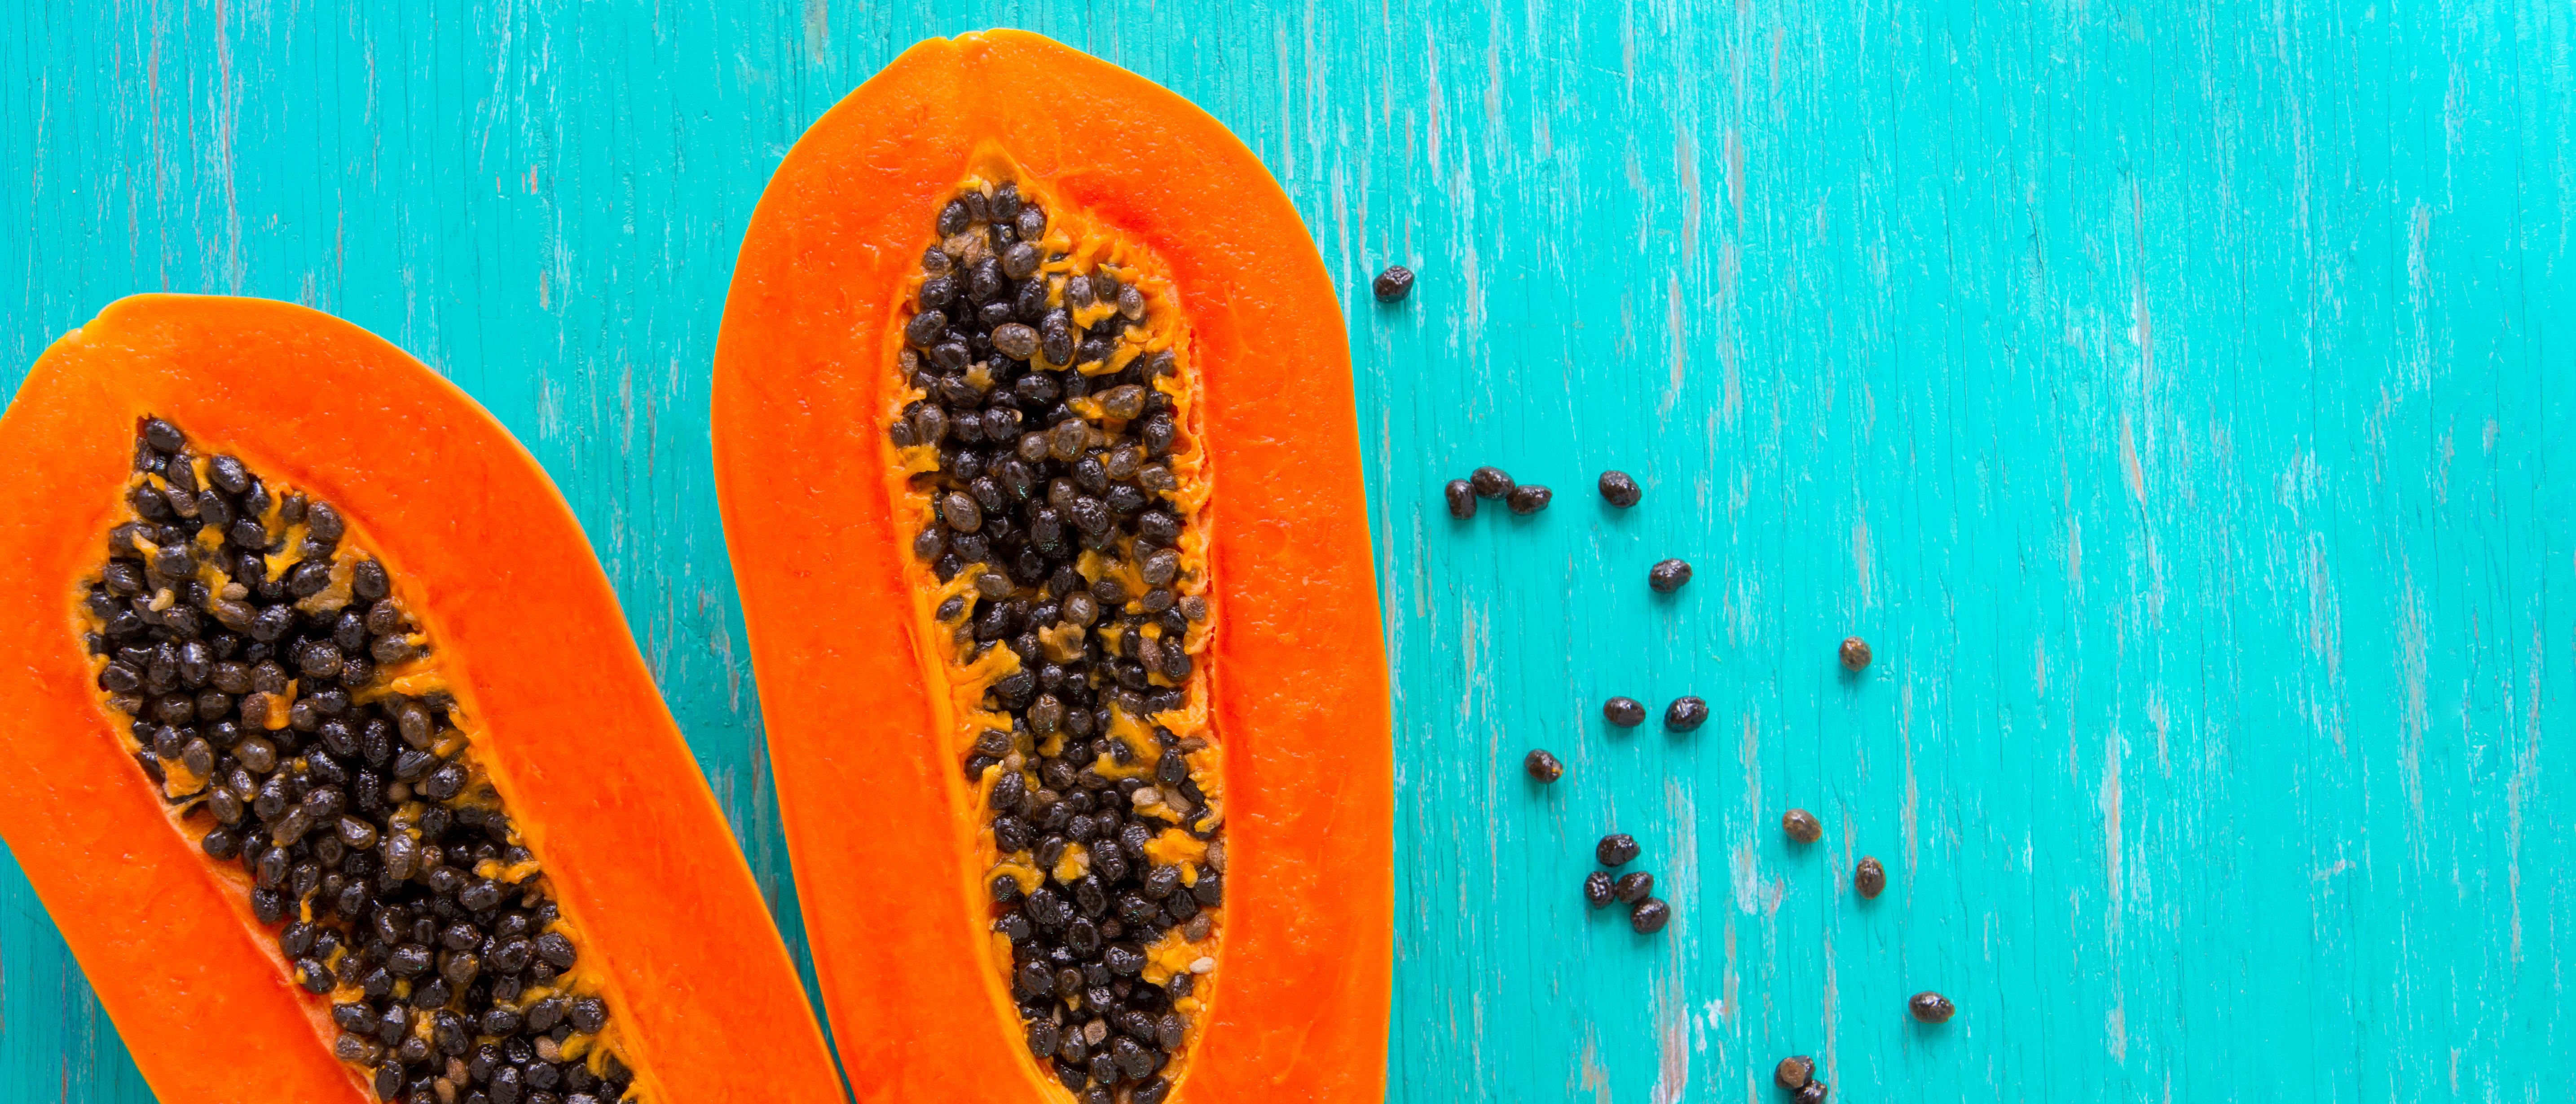 Papaya fruit on wooden background. (Shutterstock/Seksun Guntanid)